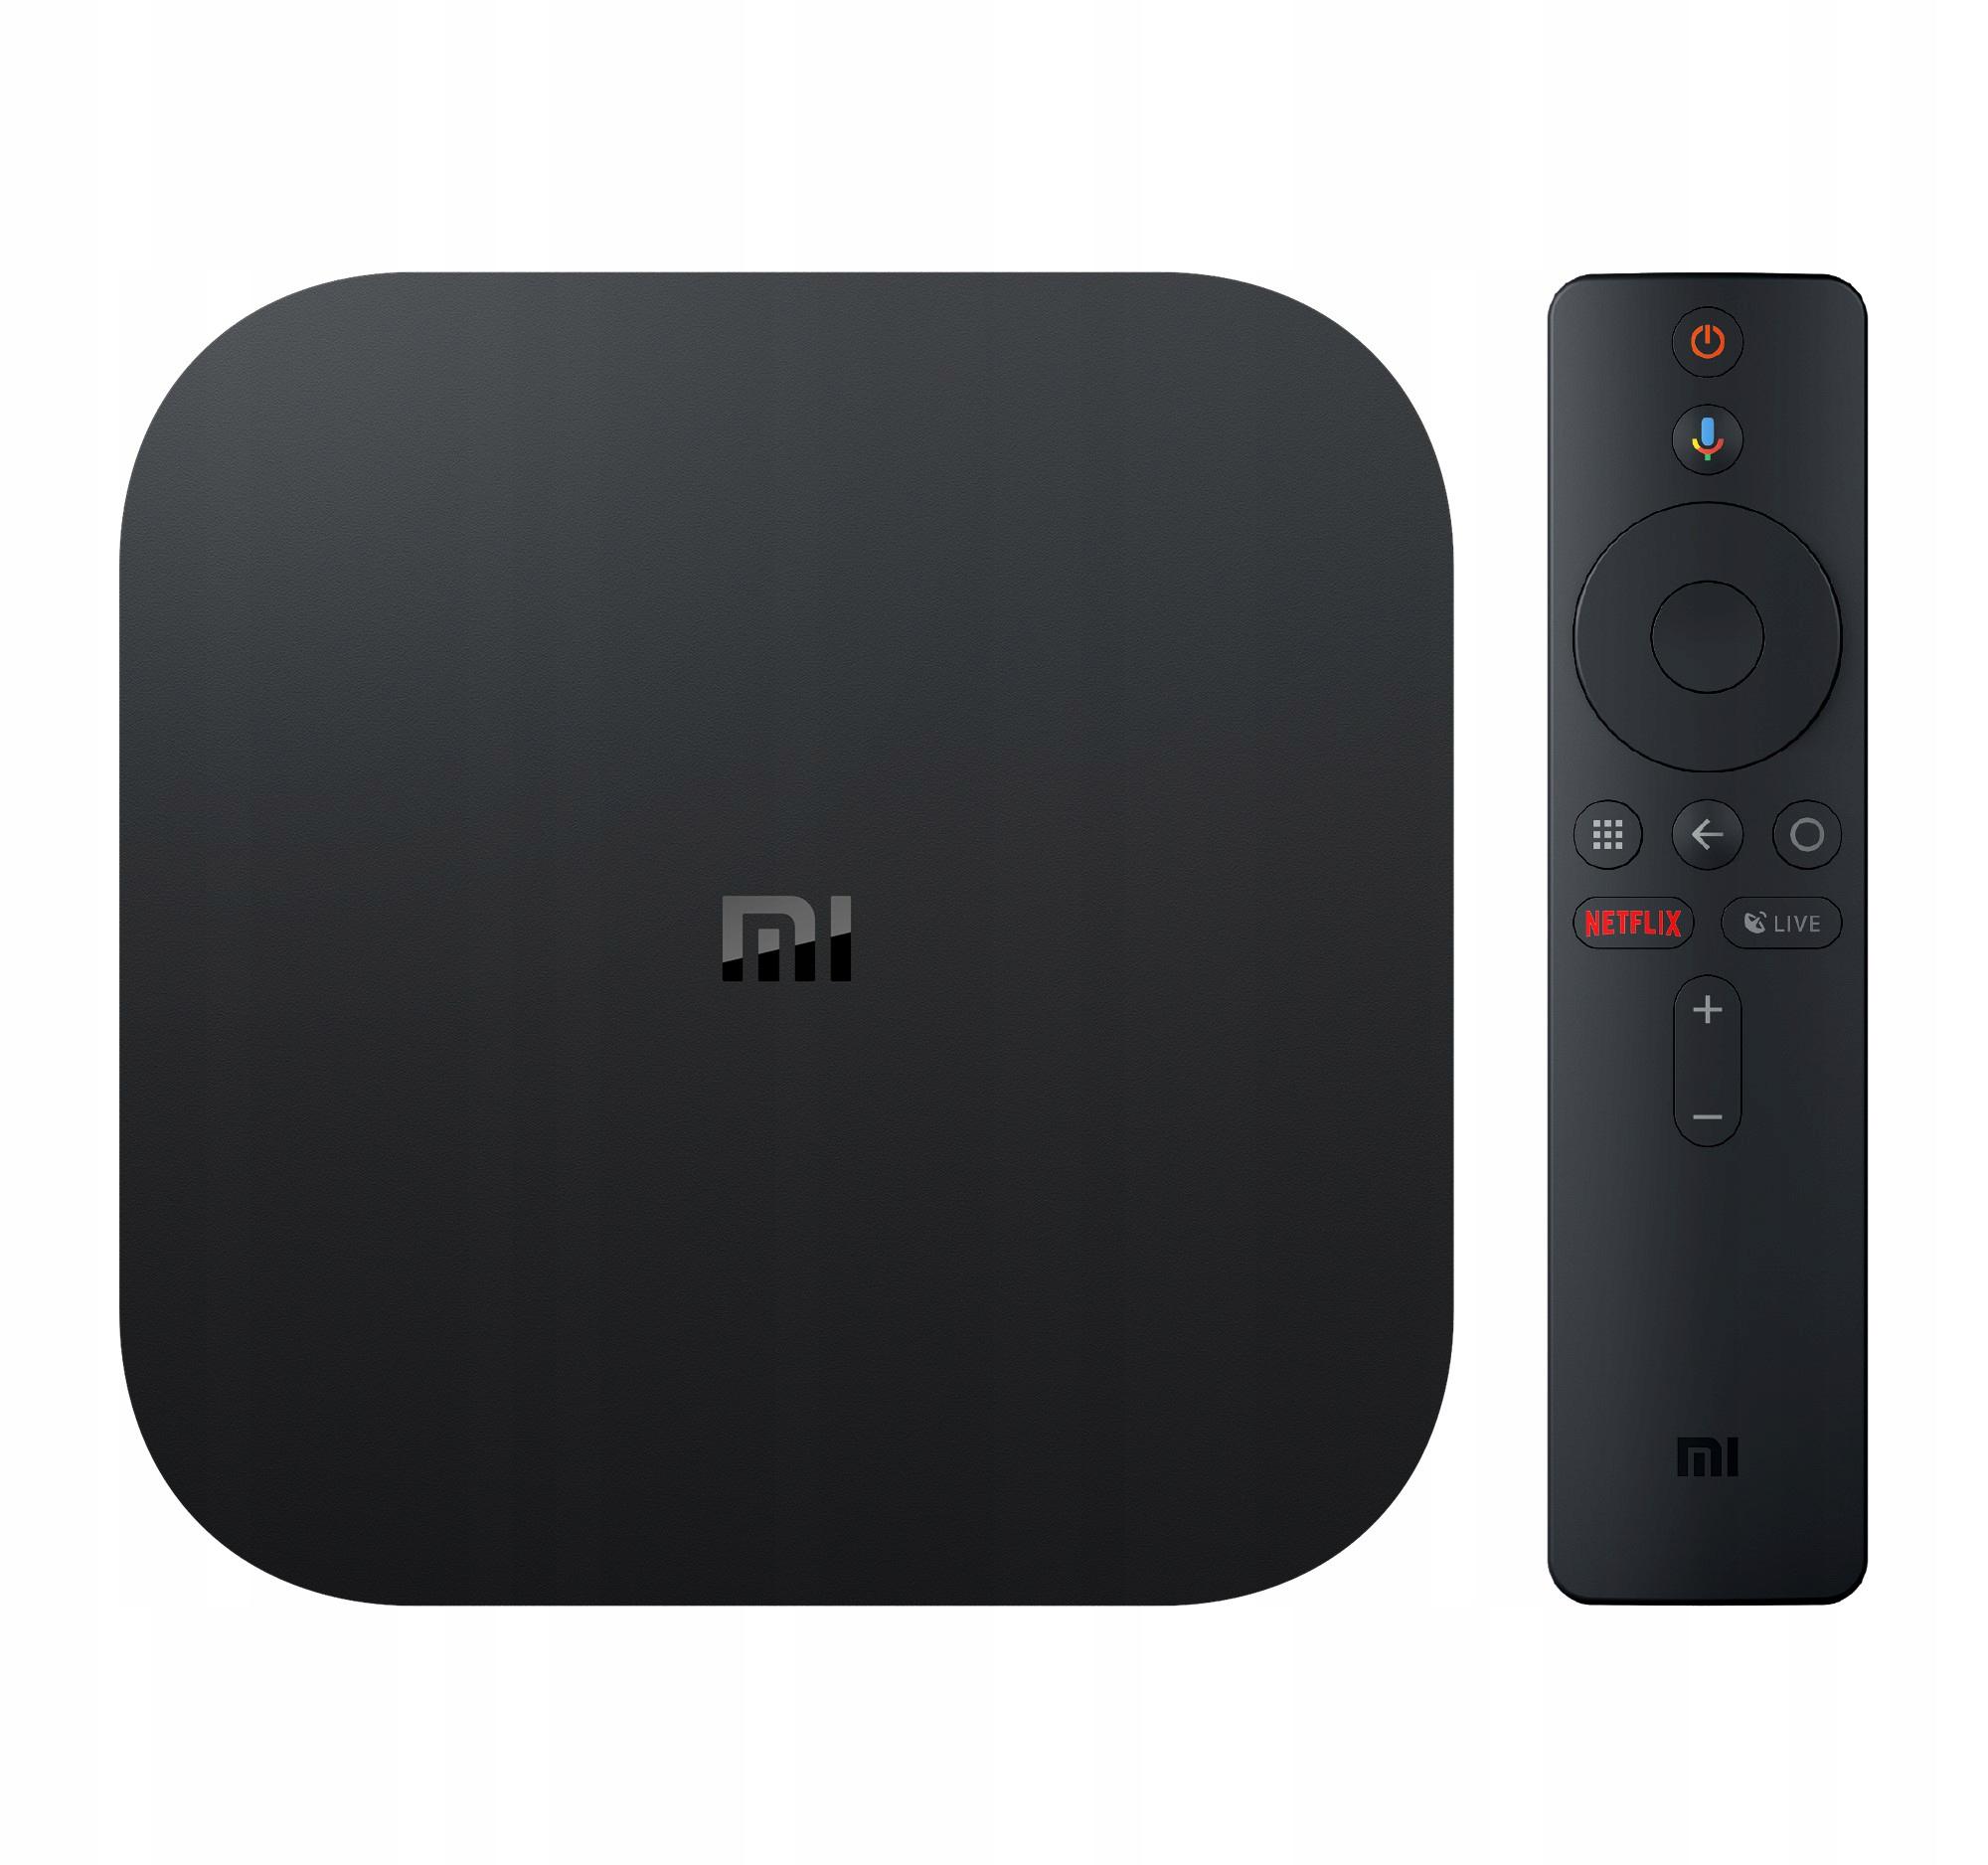 XIAOMI MI BOX S ANDRTOD TV OS HBO GO - NETFLIX 4K